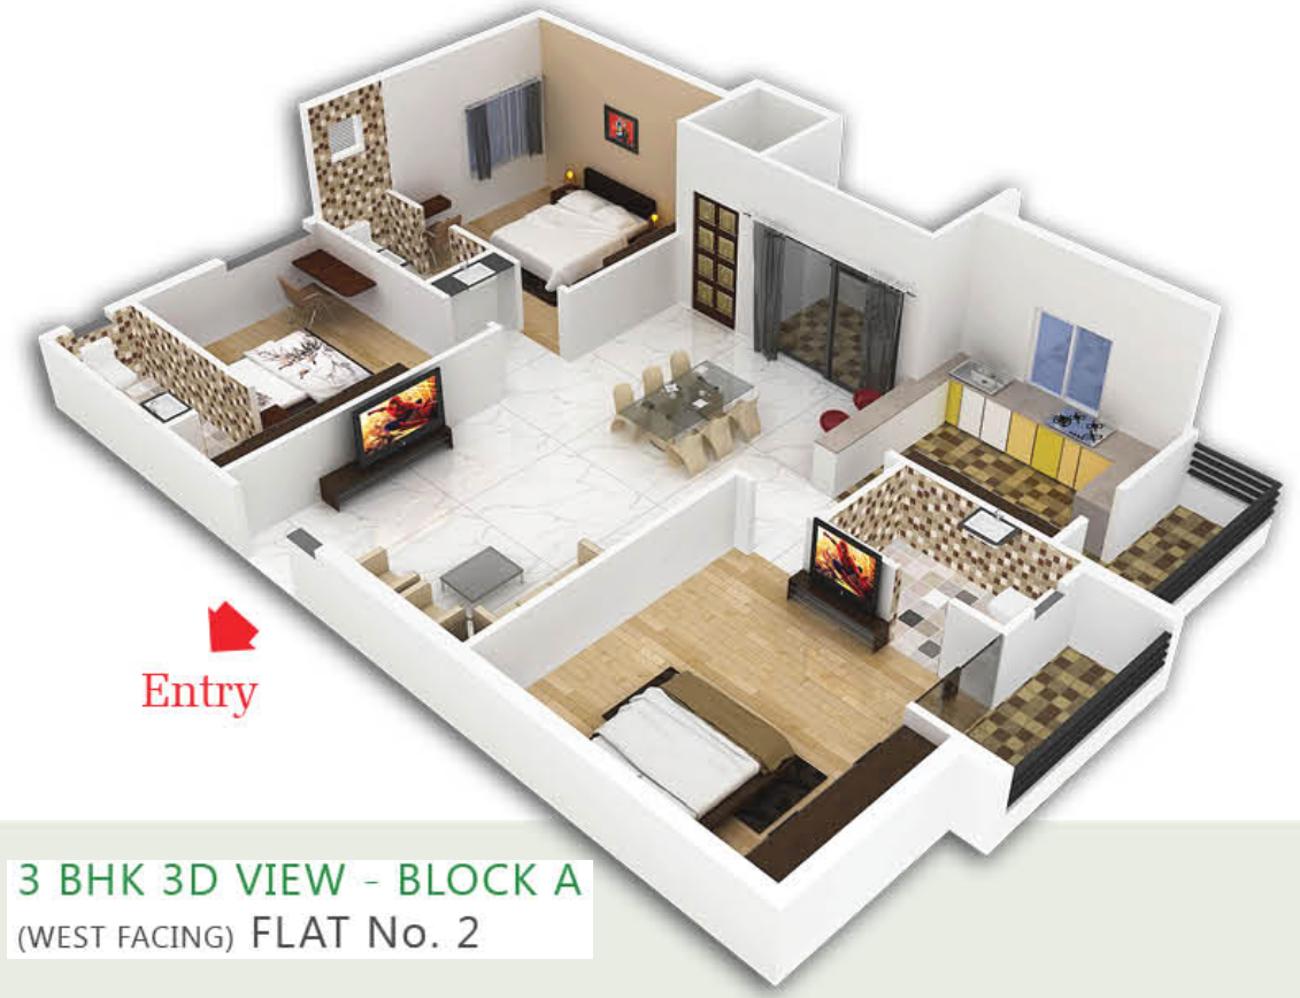 Saanvi Spring Meadows In Manikonda Hyderabad Price Location Map Solid State Relay Kolkata Floor Plan Reviews